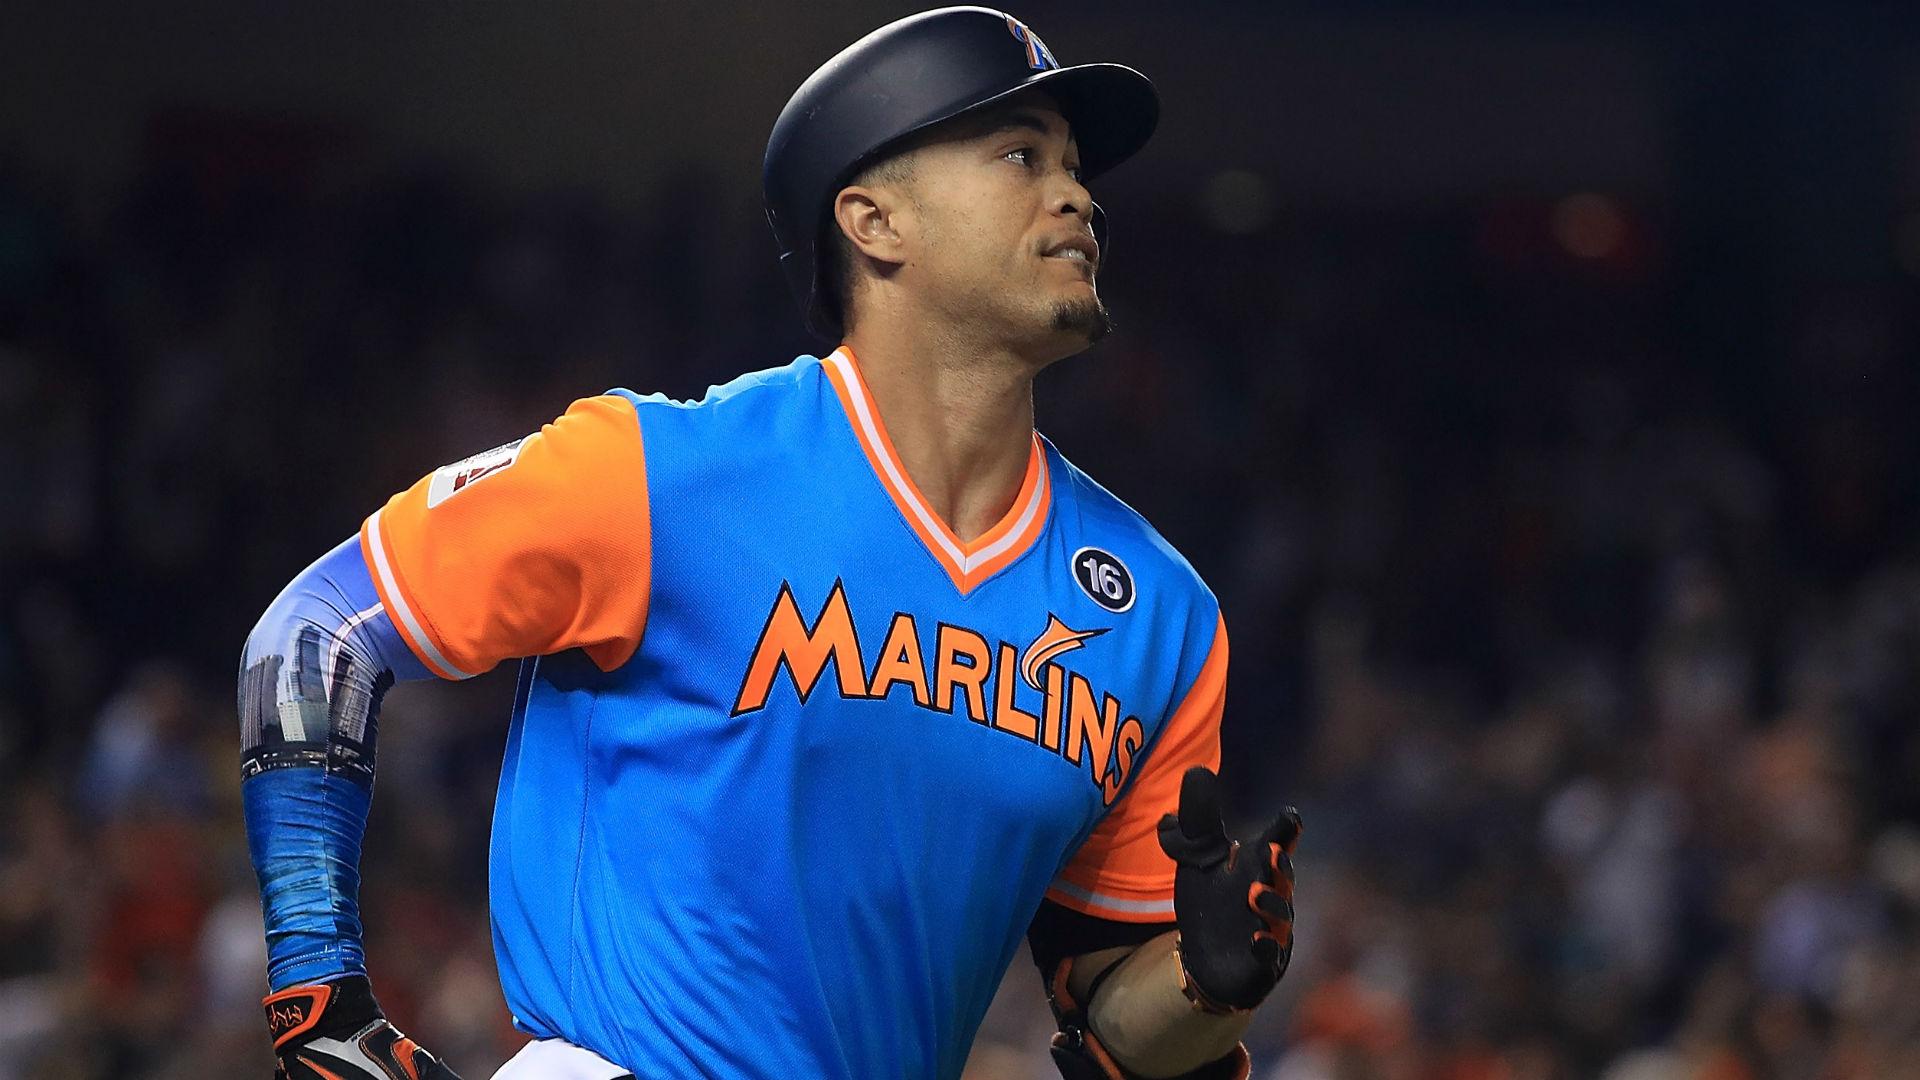 MLB trade rumors: Marlins CEO Derek Jeter says all Giancarlo Stanton talk 'speculation'